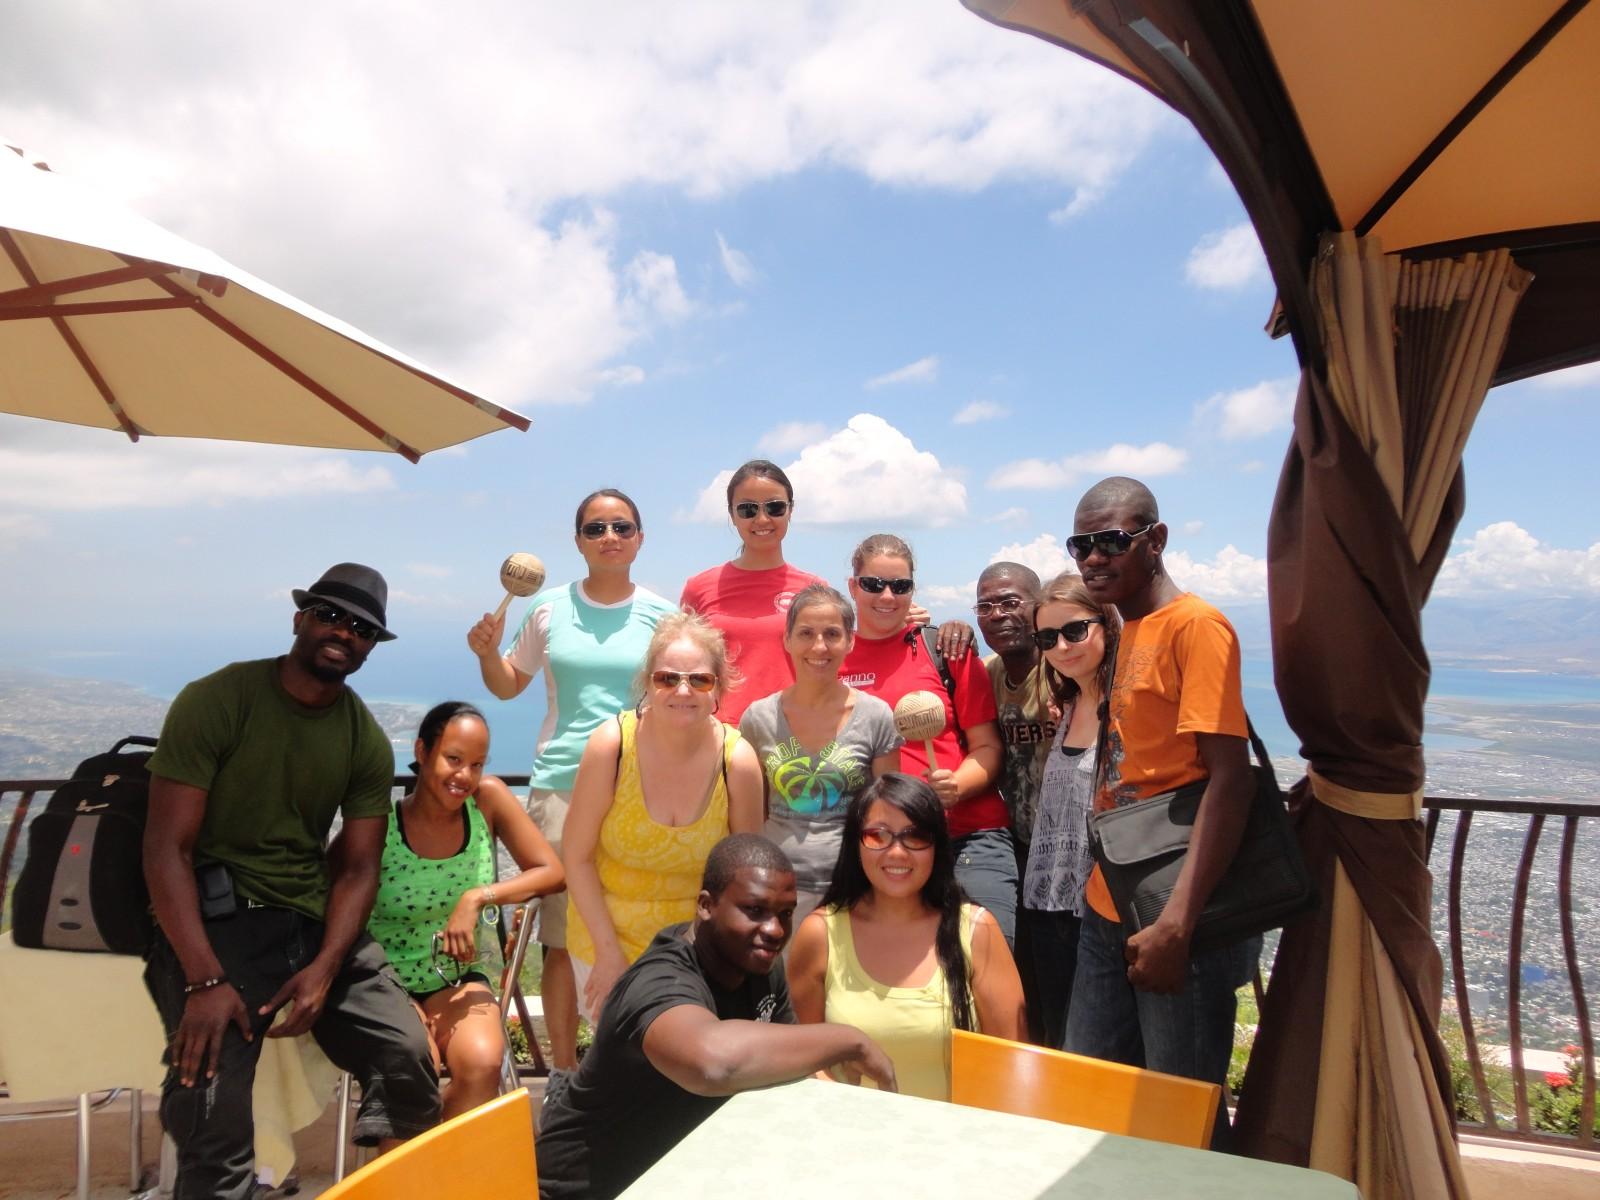 2013, Haiti, Cité Soleil, TWA, Third World Awareness, volunteers, friends, guides, mountain, charity, non-profit